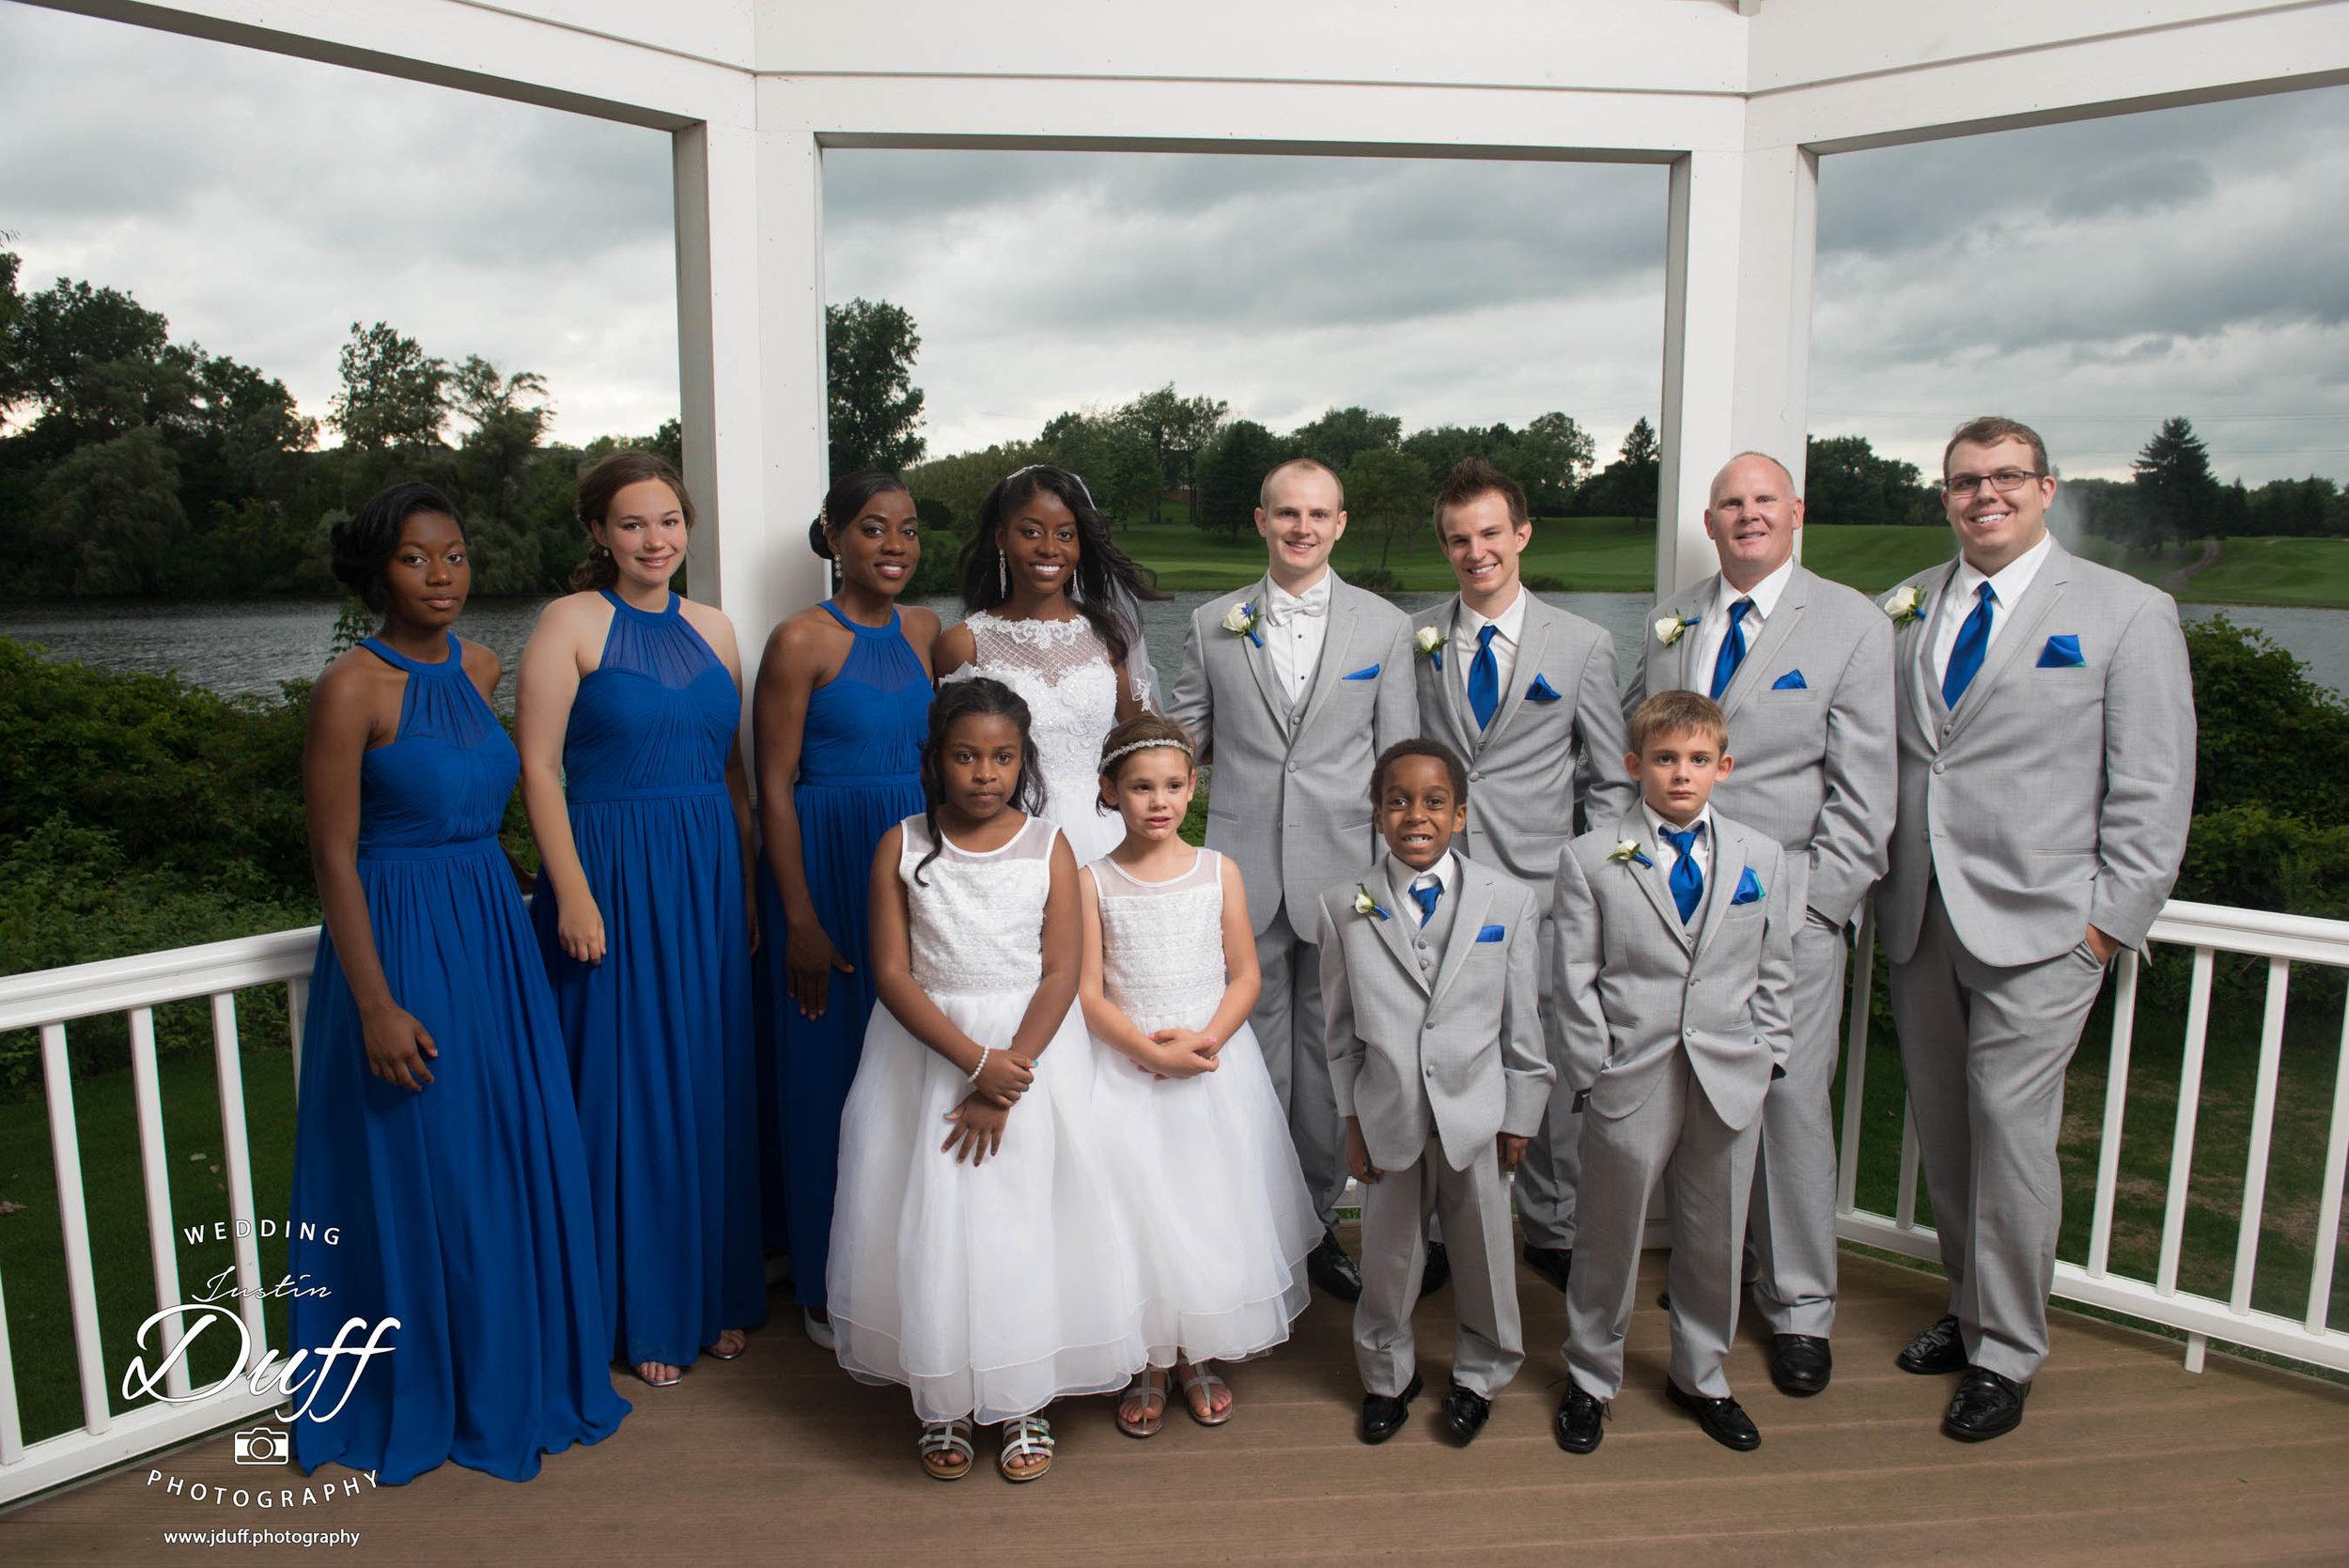 Fountains Golf Course Wedding - Royal Oak Photographer – Deanna & Shane wedding party in the gazebo overlooking a pond